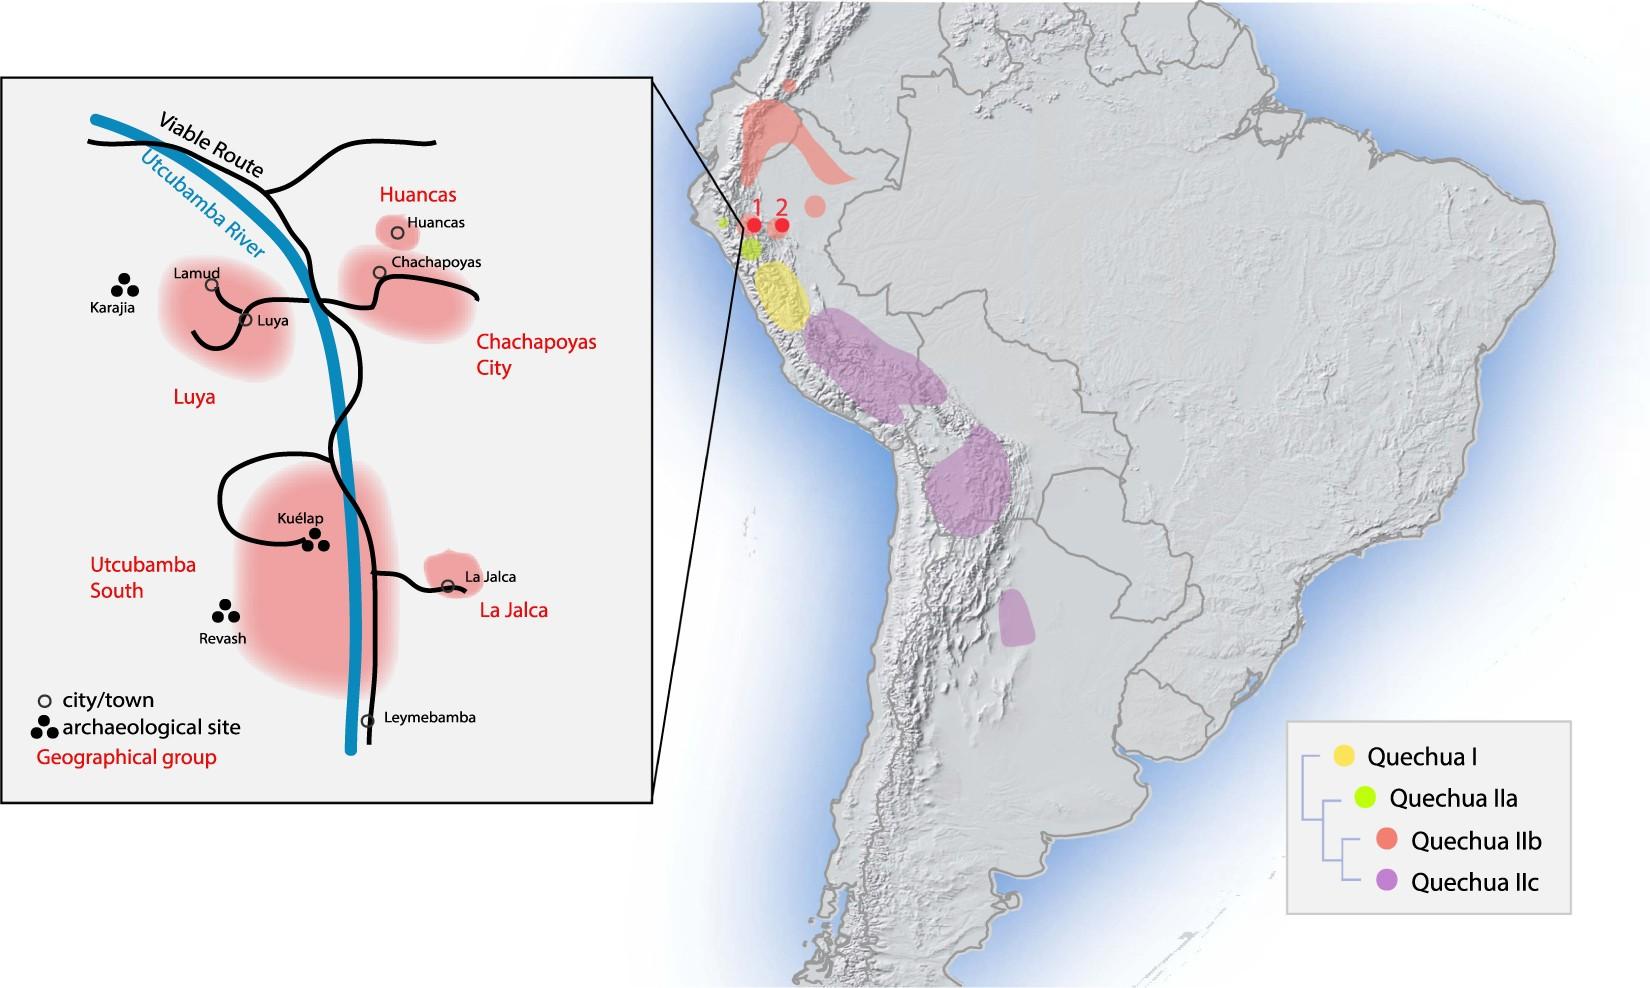 Enclaves of genetic diversity resisted Inca impacts on potion ... on inca suspension bridges, sacsayhuamán, inca sapa inca, inca terrace farming, incan agriculture, incan architecture, sacred valley, inca leader, inca road system, inca aqueducts, inca territorie, inca indians, inca architecture, inca empire, inca people, the incas map, machu picchu, inca art, inca beliefs, inca nobles, inca society, inca cuzco, cuzco map, inca education, inca roads and bridges, inca warriors, norte chico civilization, tambo colorado, inca contributions,